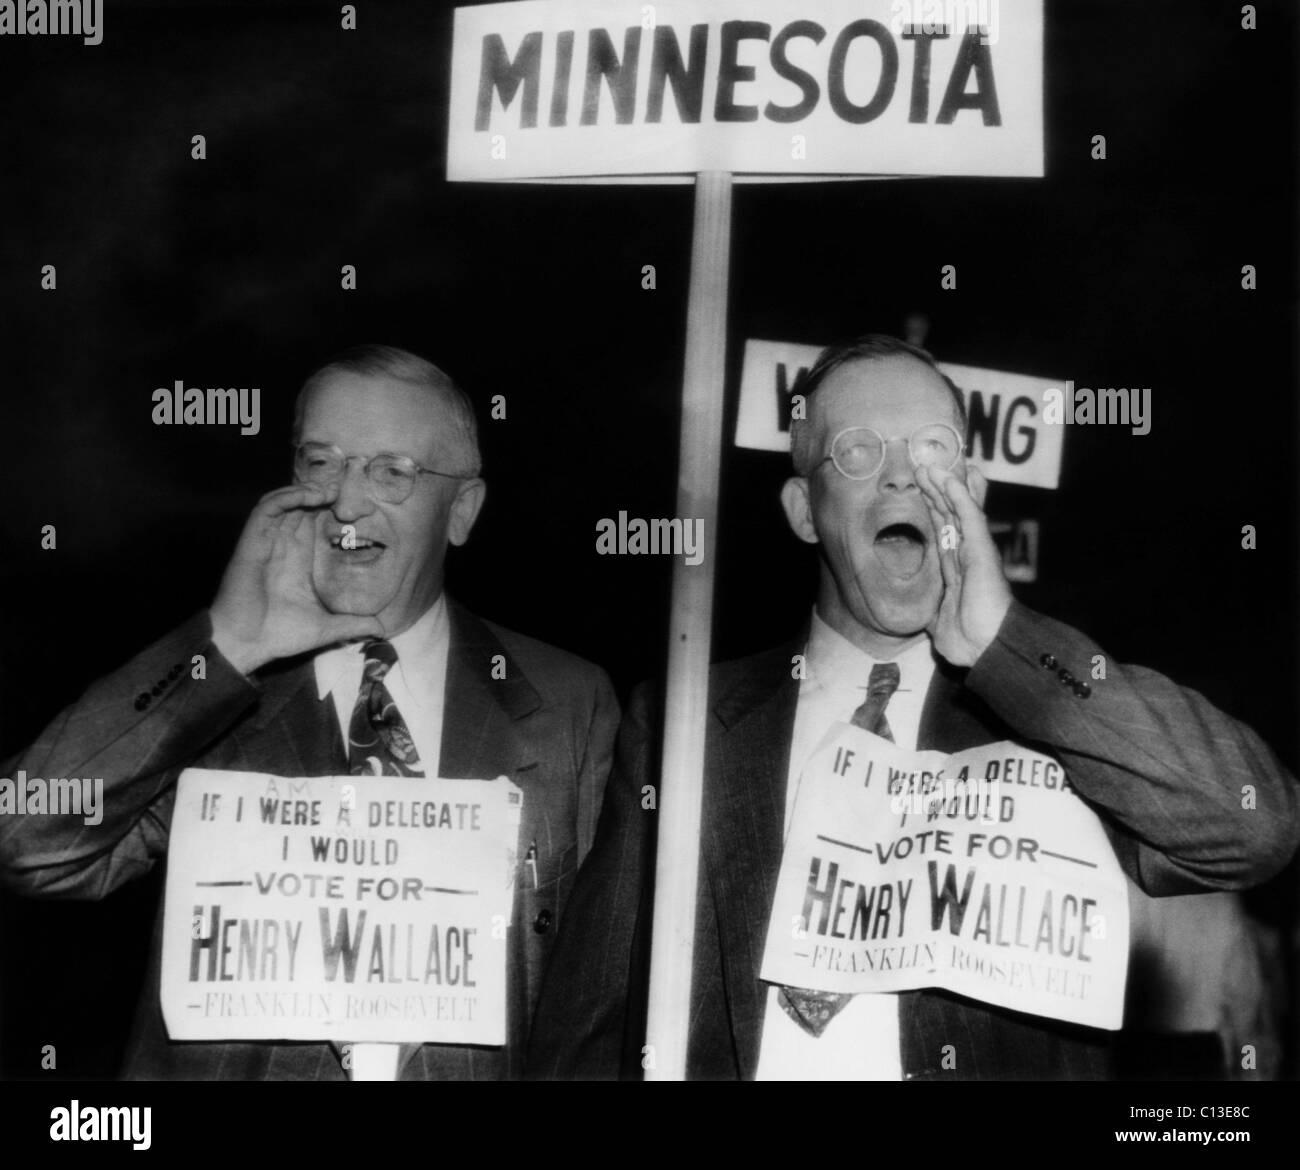 US Elections. From left: Minnesota delegates Halvor Langslet and Bennie Brandt call for the re-nomination of Henry - Stock Image